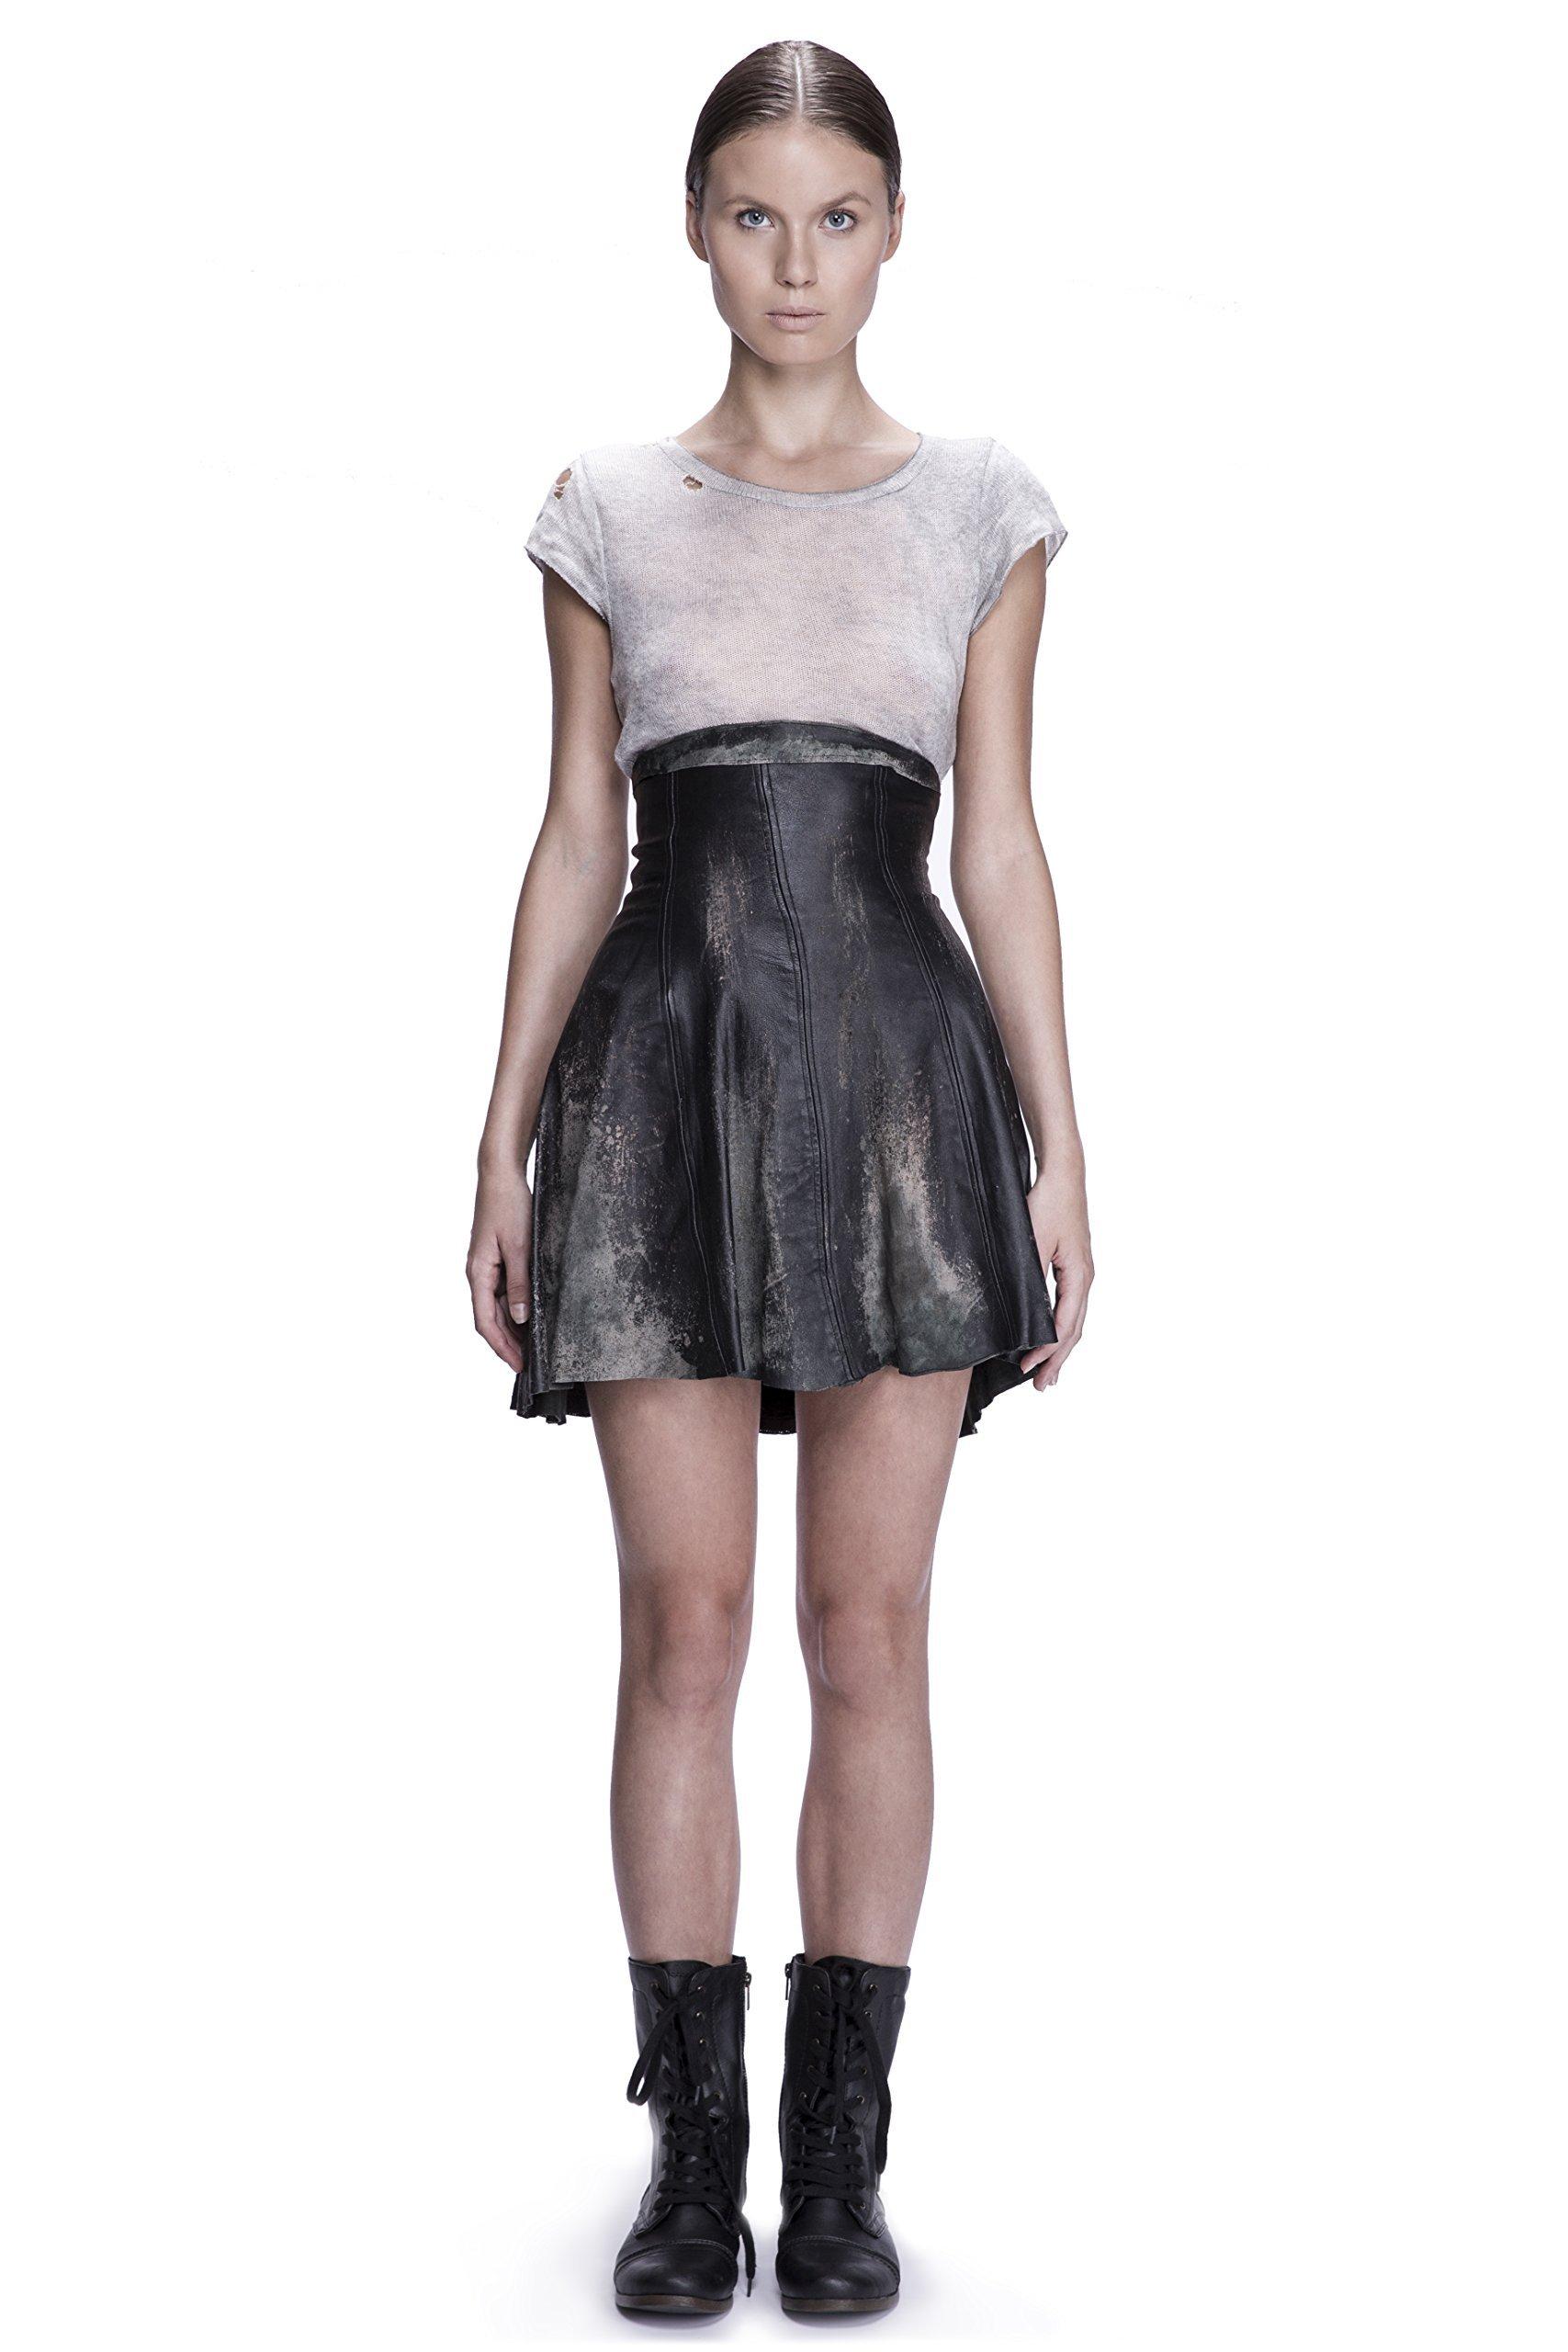 High Waist Acid Wash Skirt by Corvus + Crux